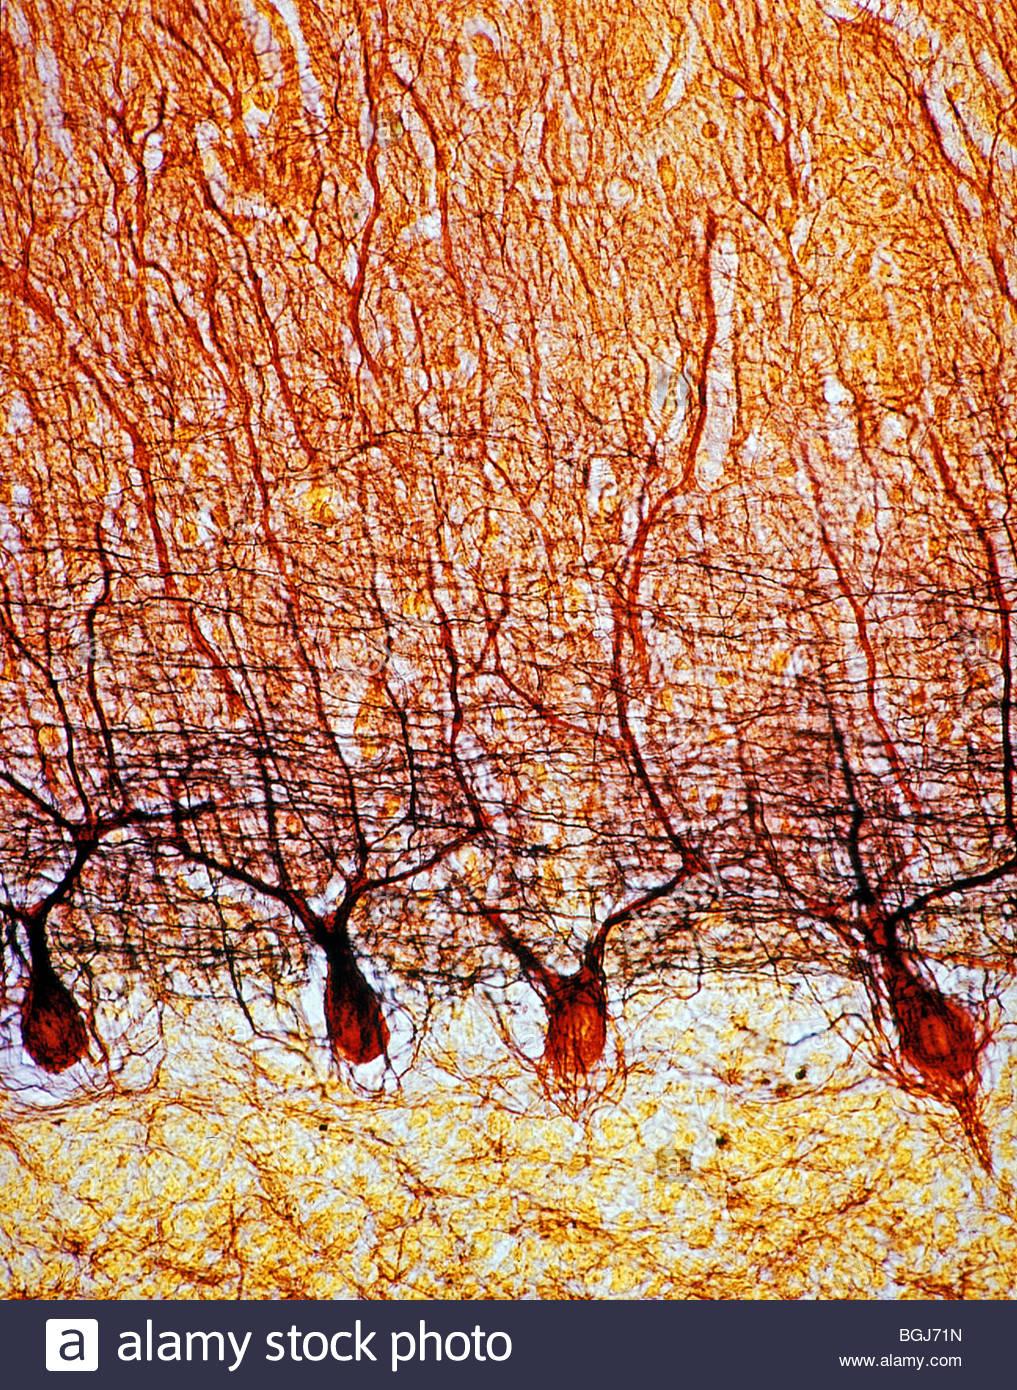 cerebellum purkinje cells 150x stock photo royalty